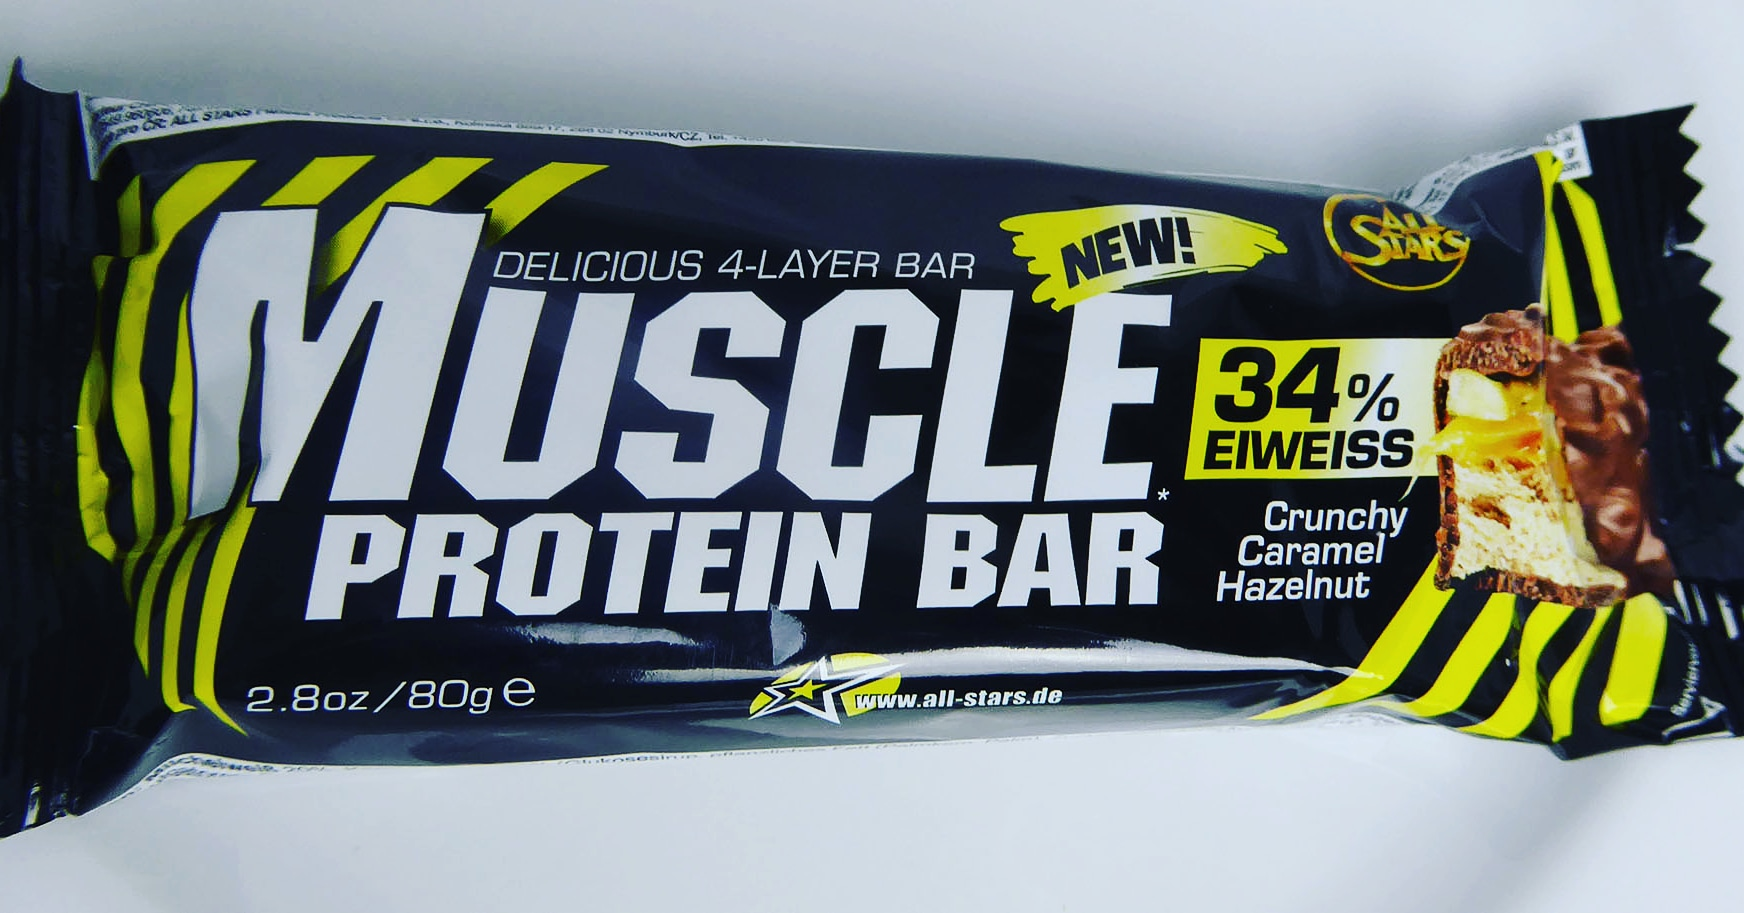 AllStars Muscle Protein Bar Crunchy Caramel Hazelnut